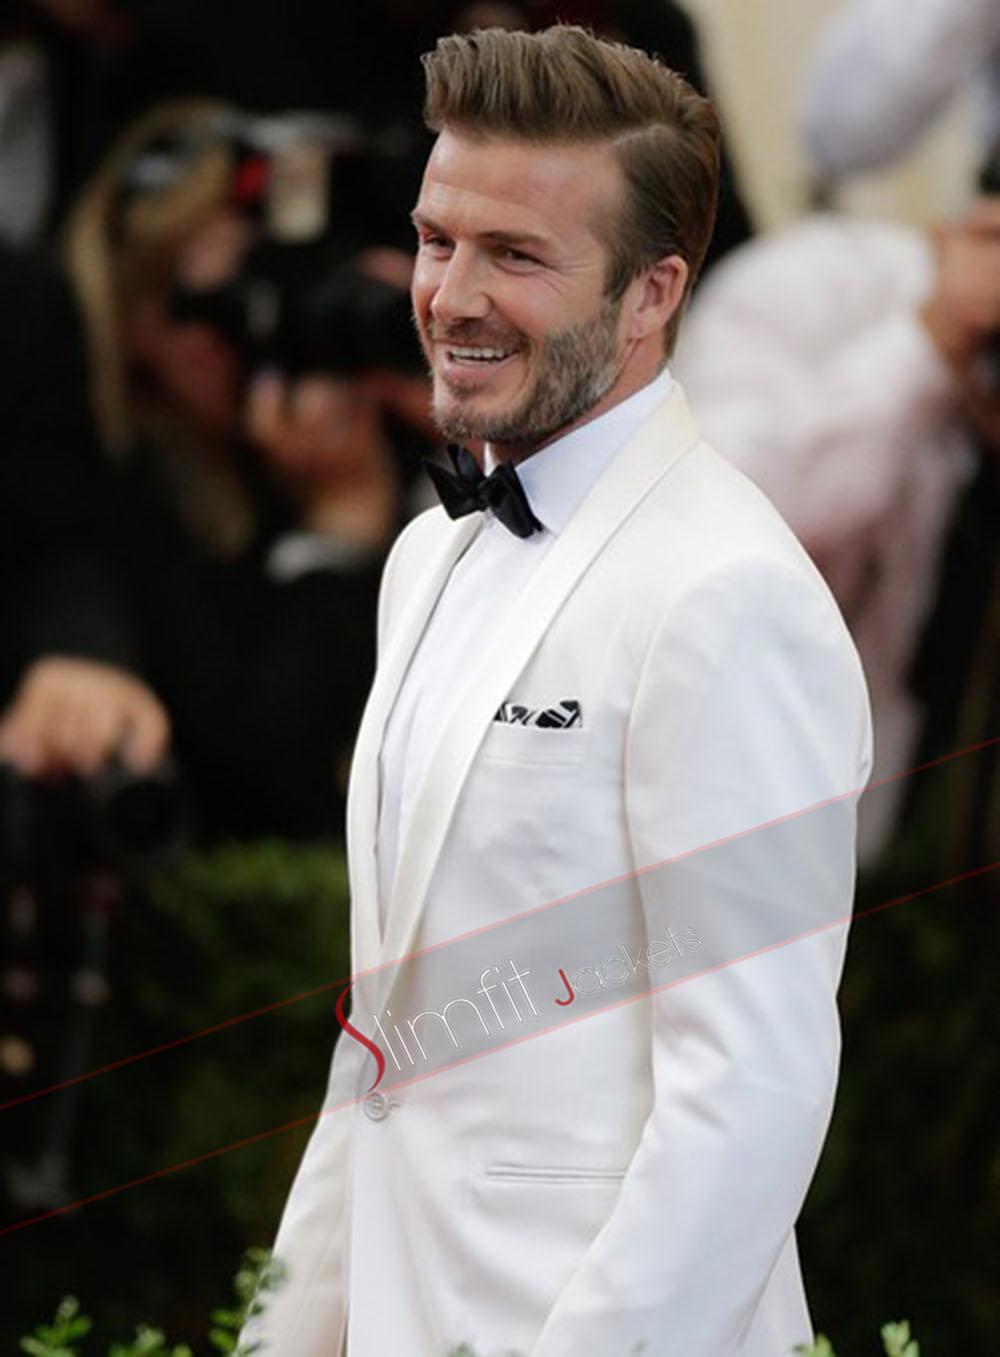 The Great Gatsby Leonardo Dicaprio Suit